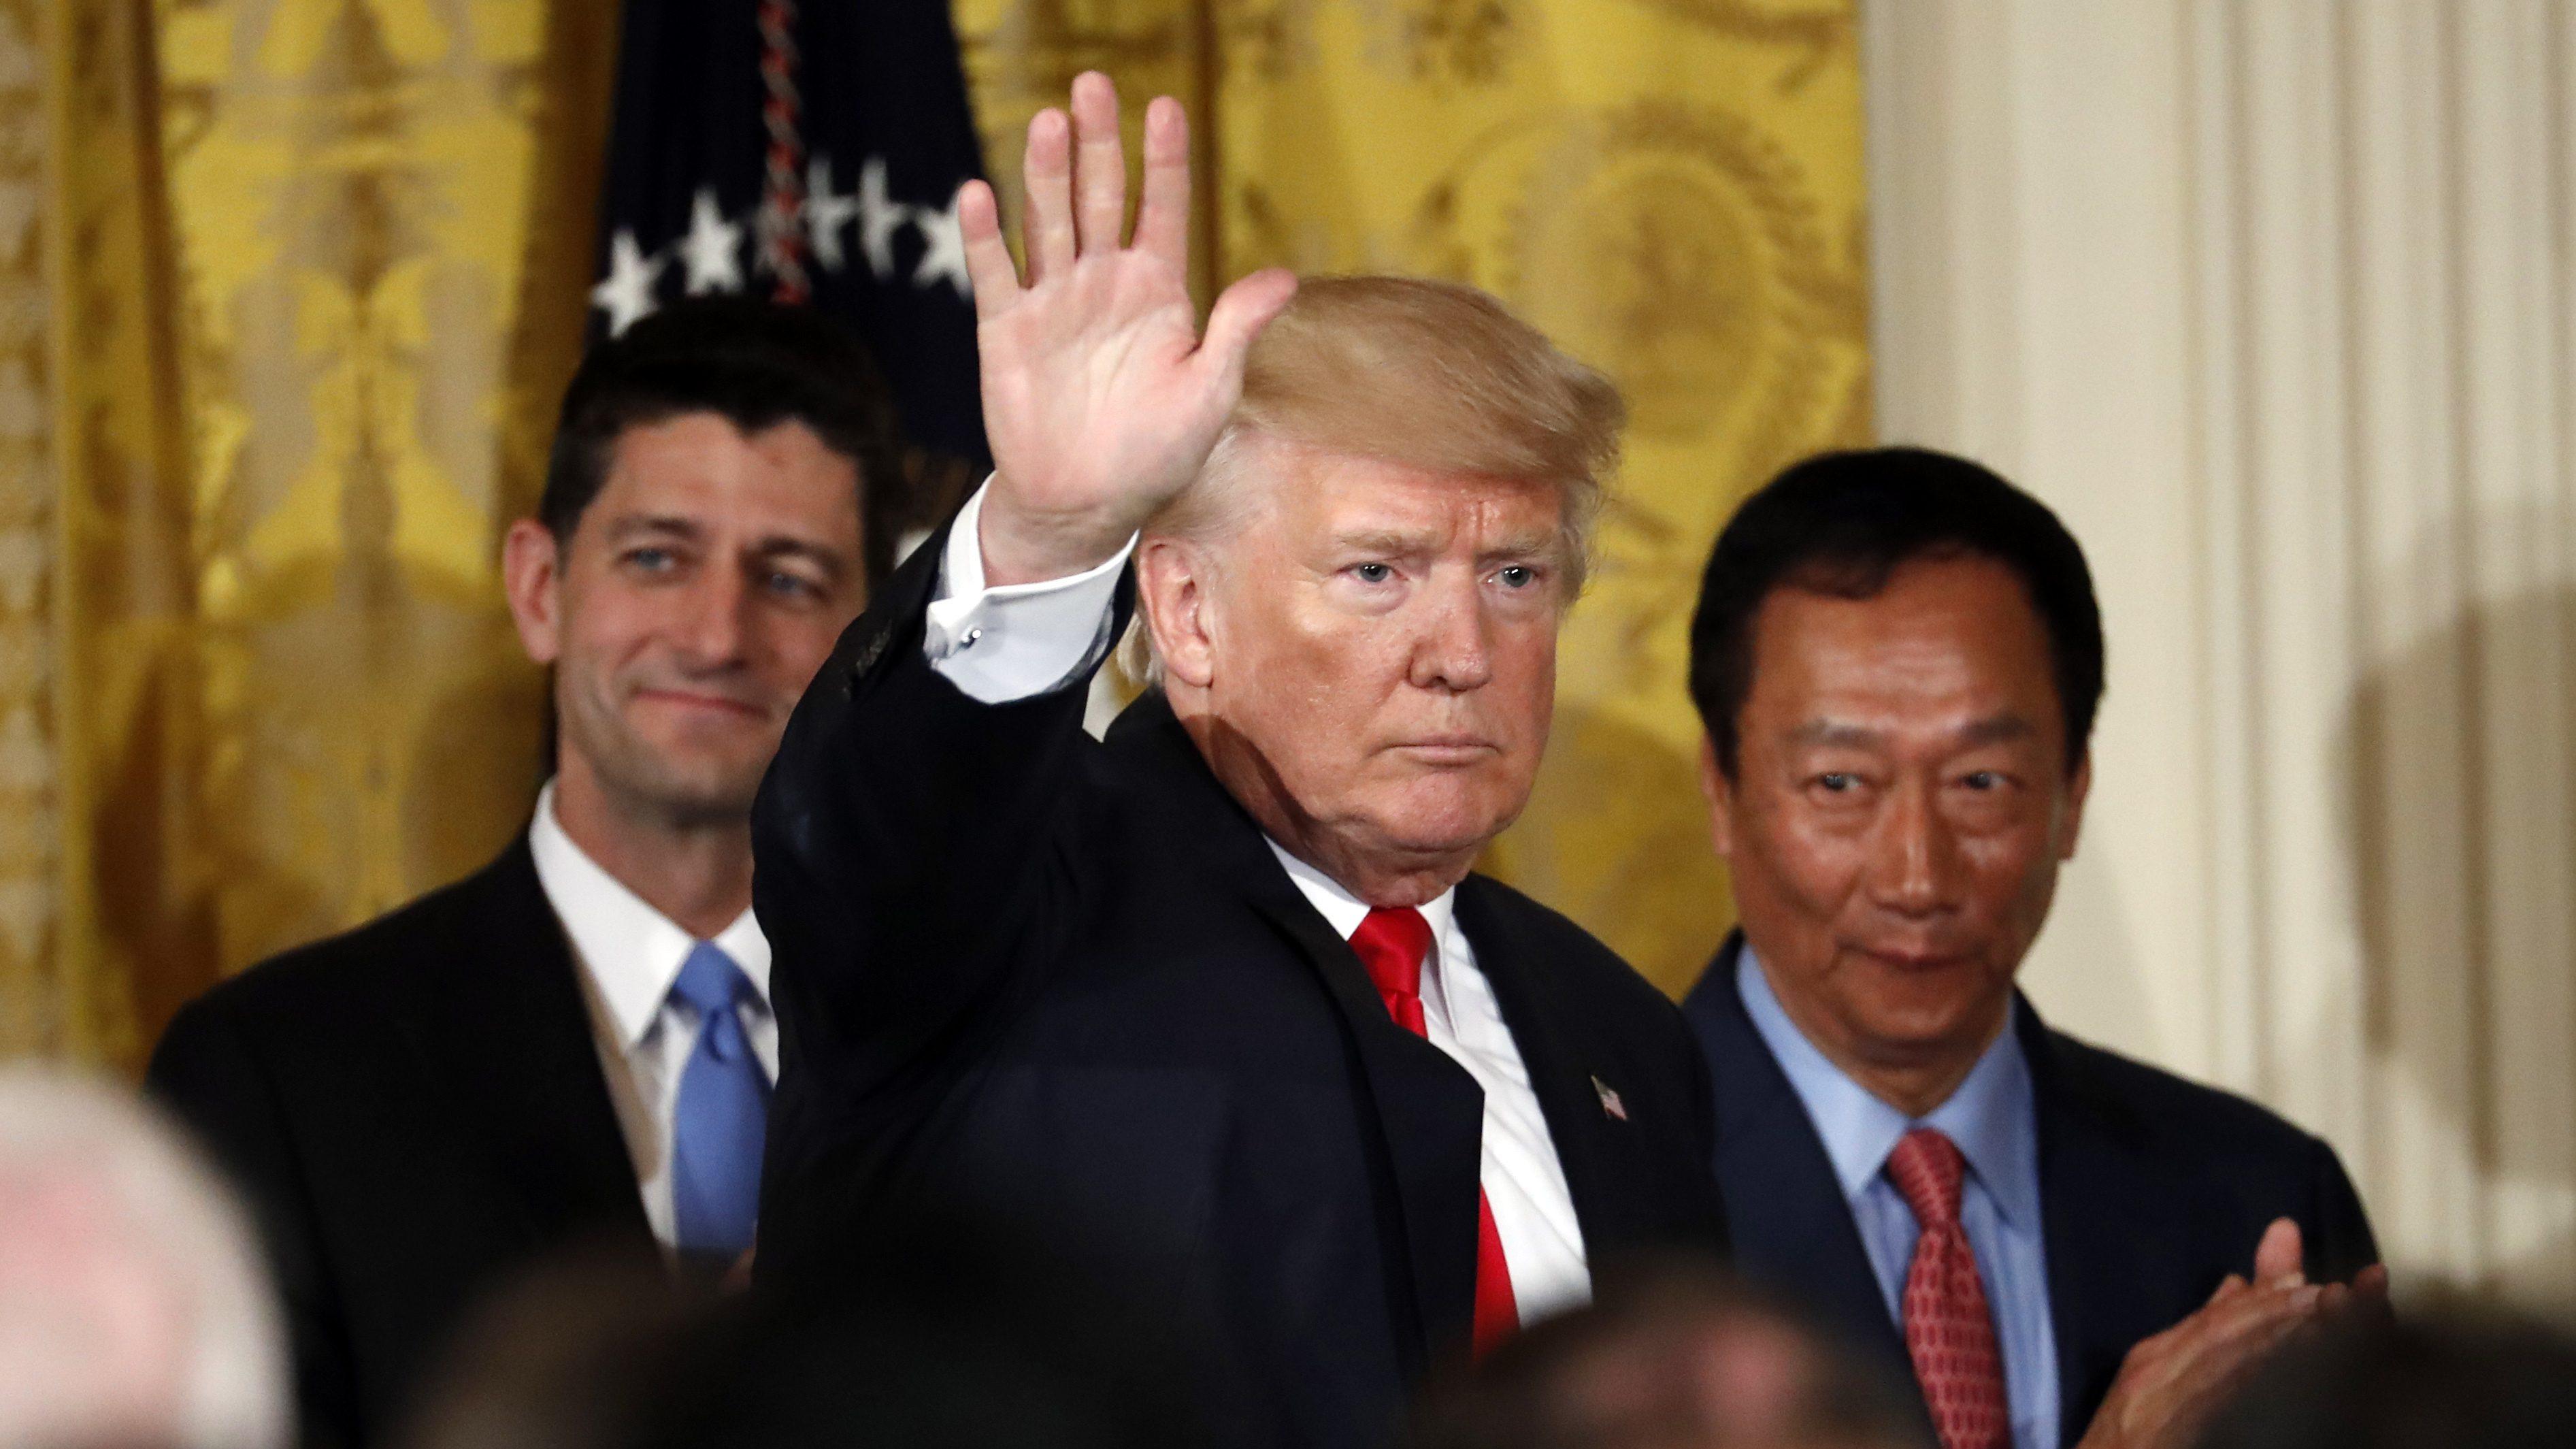 President Donald Trump,  House Speaker Paul Ryan, and Terry Gou